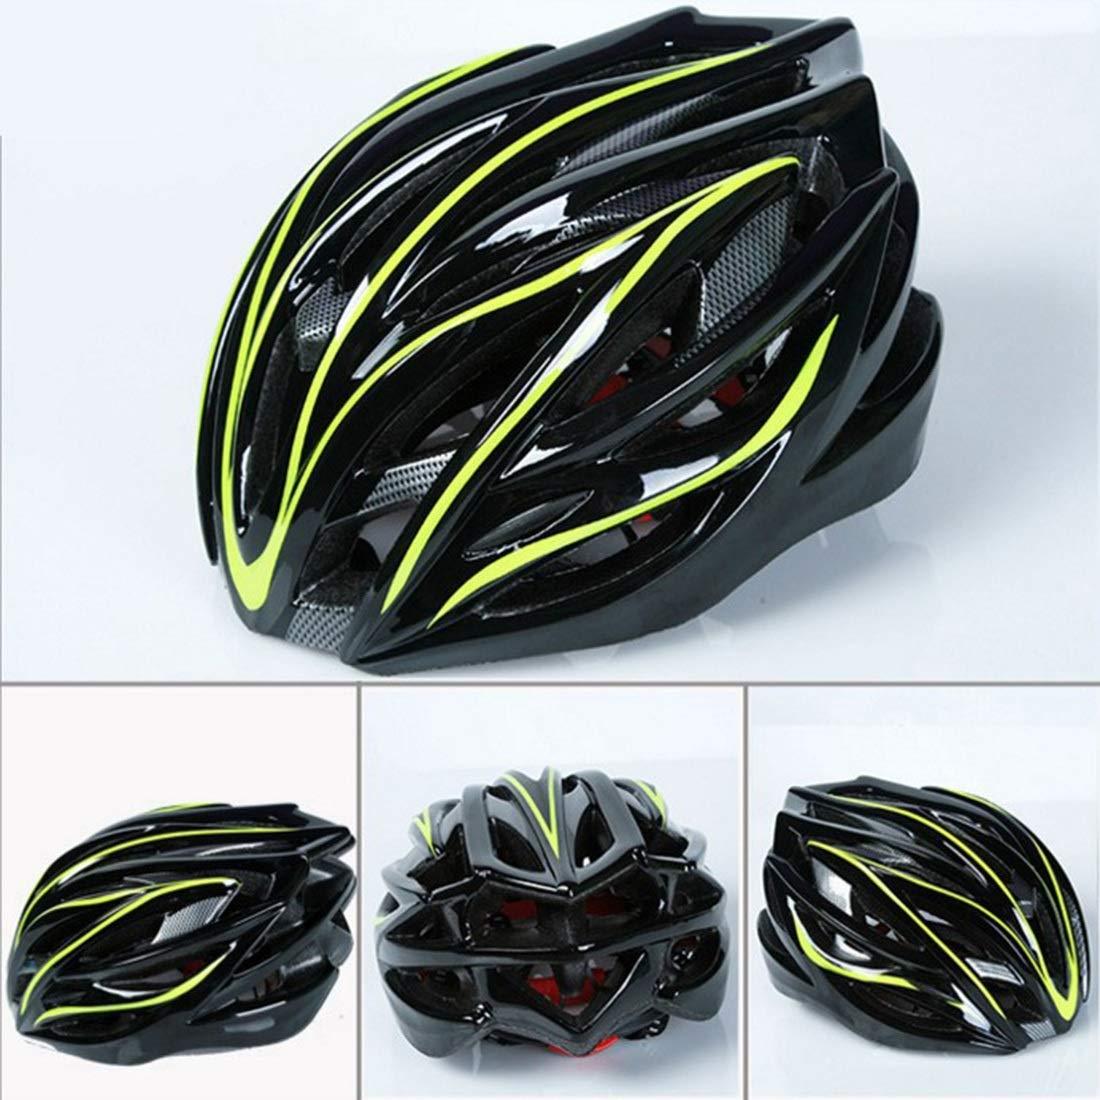 LKJASDHL 取り外し可能なバイザーが付いている のエアフローバイクヘルメットパッドを入れられた及び大人の男性と女性と若者のティーンエイジャーのために調節可能快適な軽量通気性の屋外の乗馬用品 イエロー